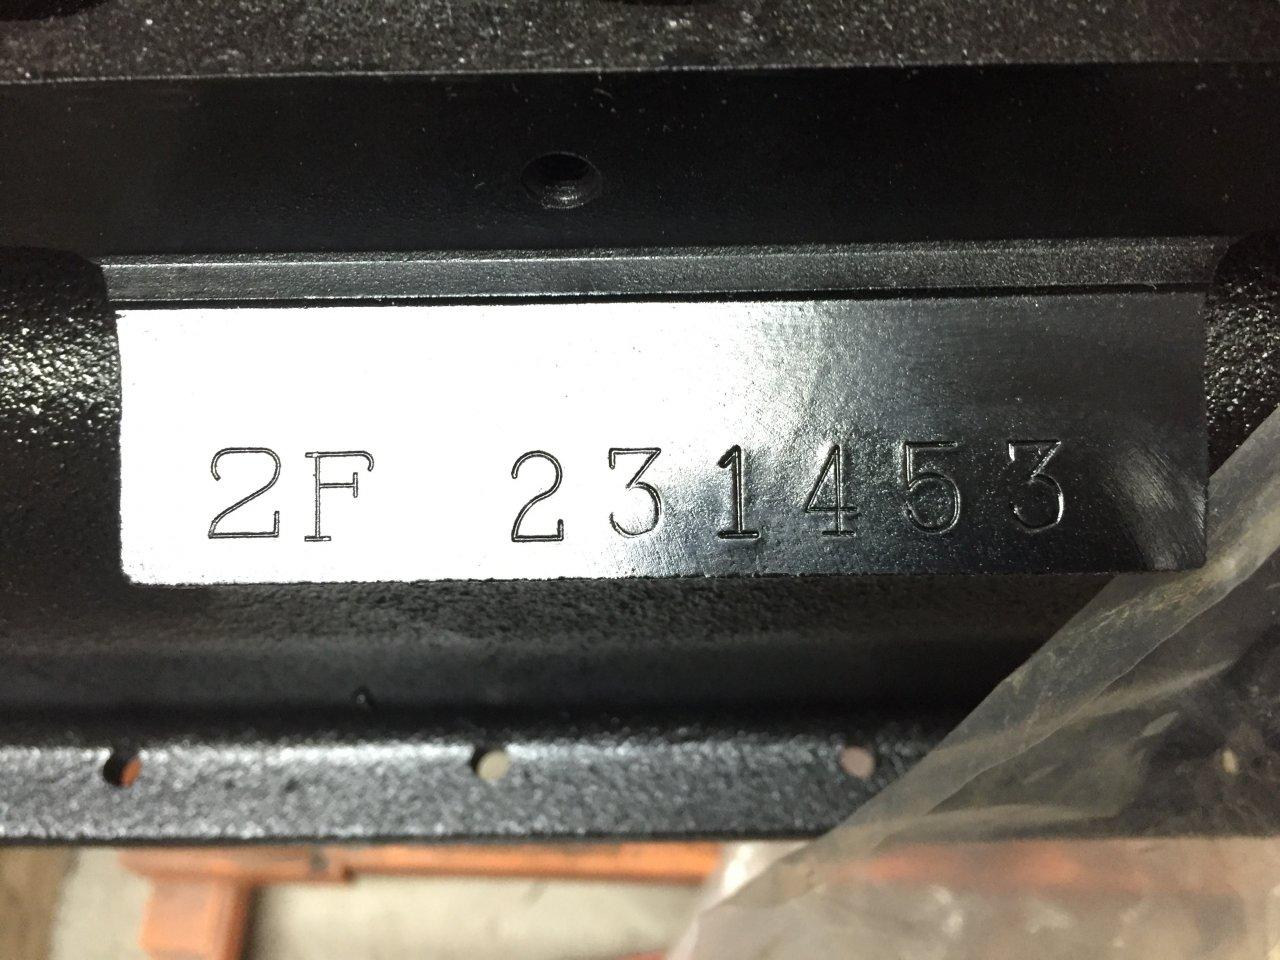 For Sale - 1978: 2F Rebuilt Engine - NEW/Zero Miles | IH8MUD